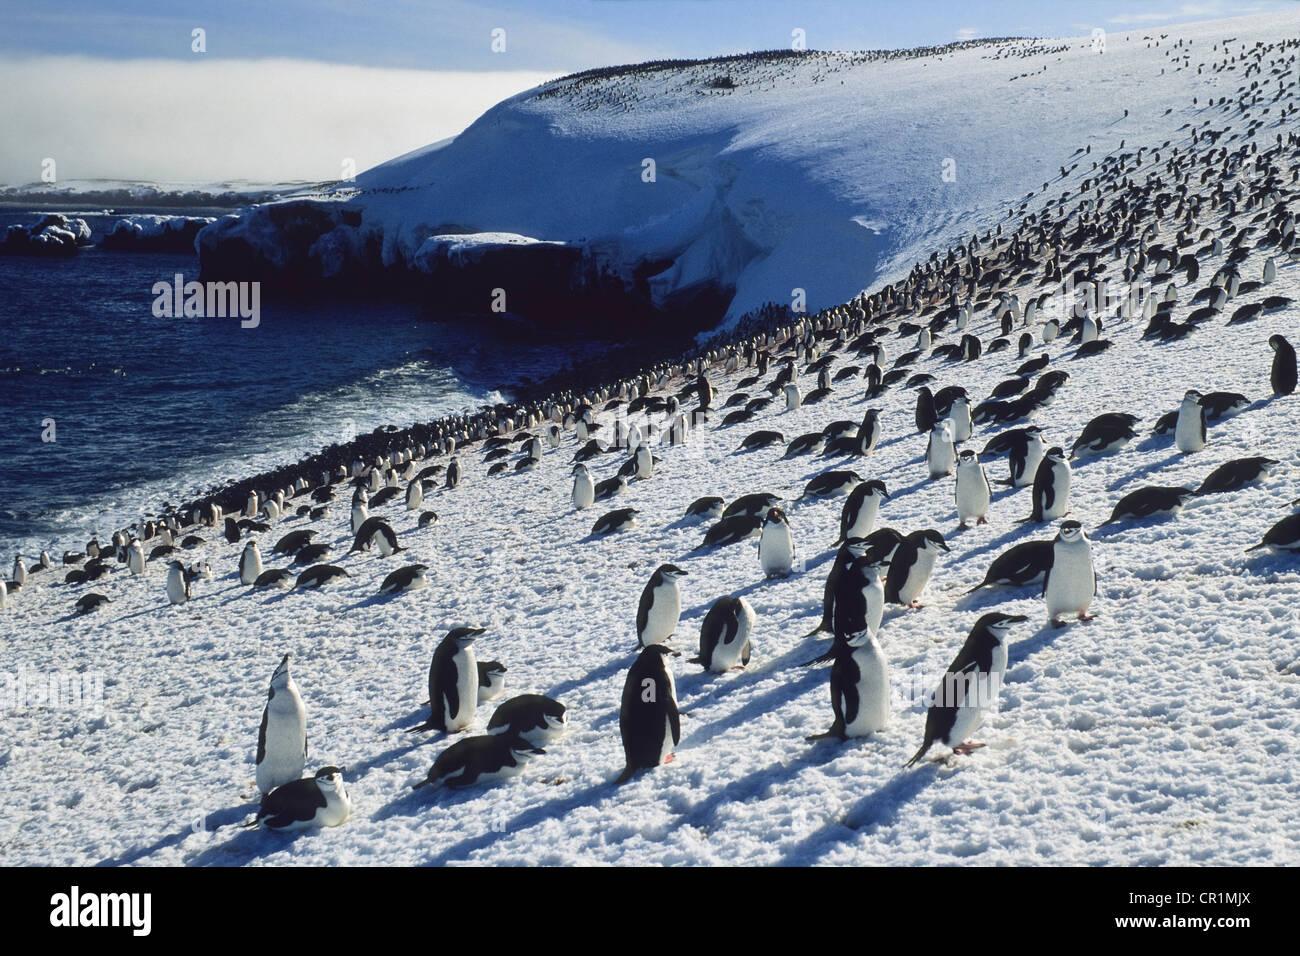 Chinstrap penguins (Pygoscelis antarctica) on Zavodovski Island, South Sandwich Islands, Antarctica Stock Photo